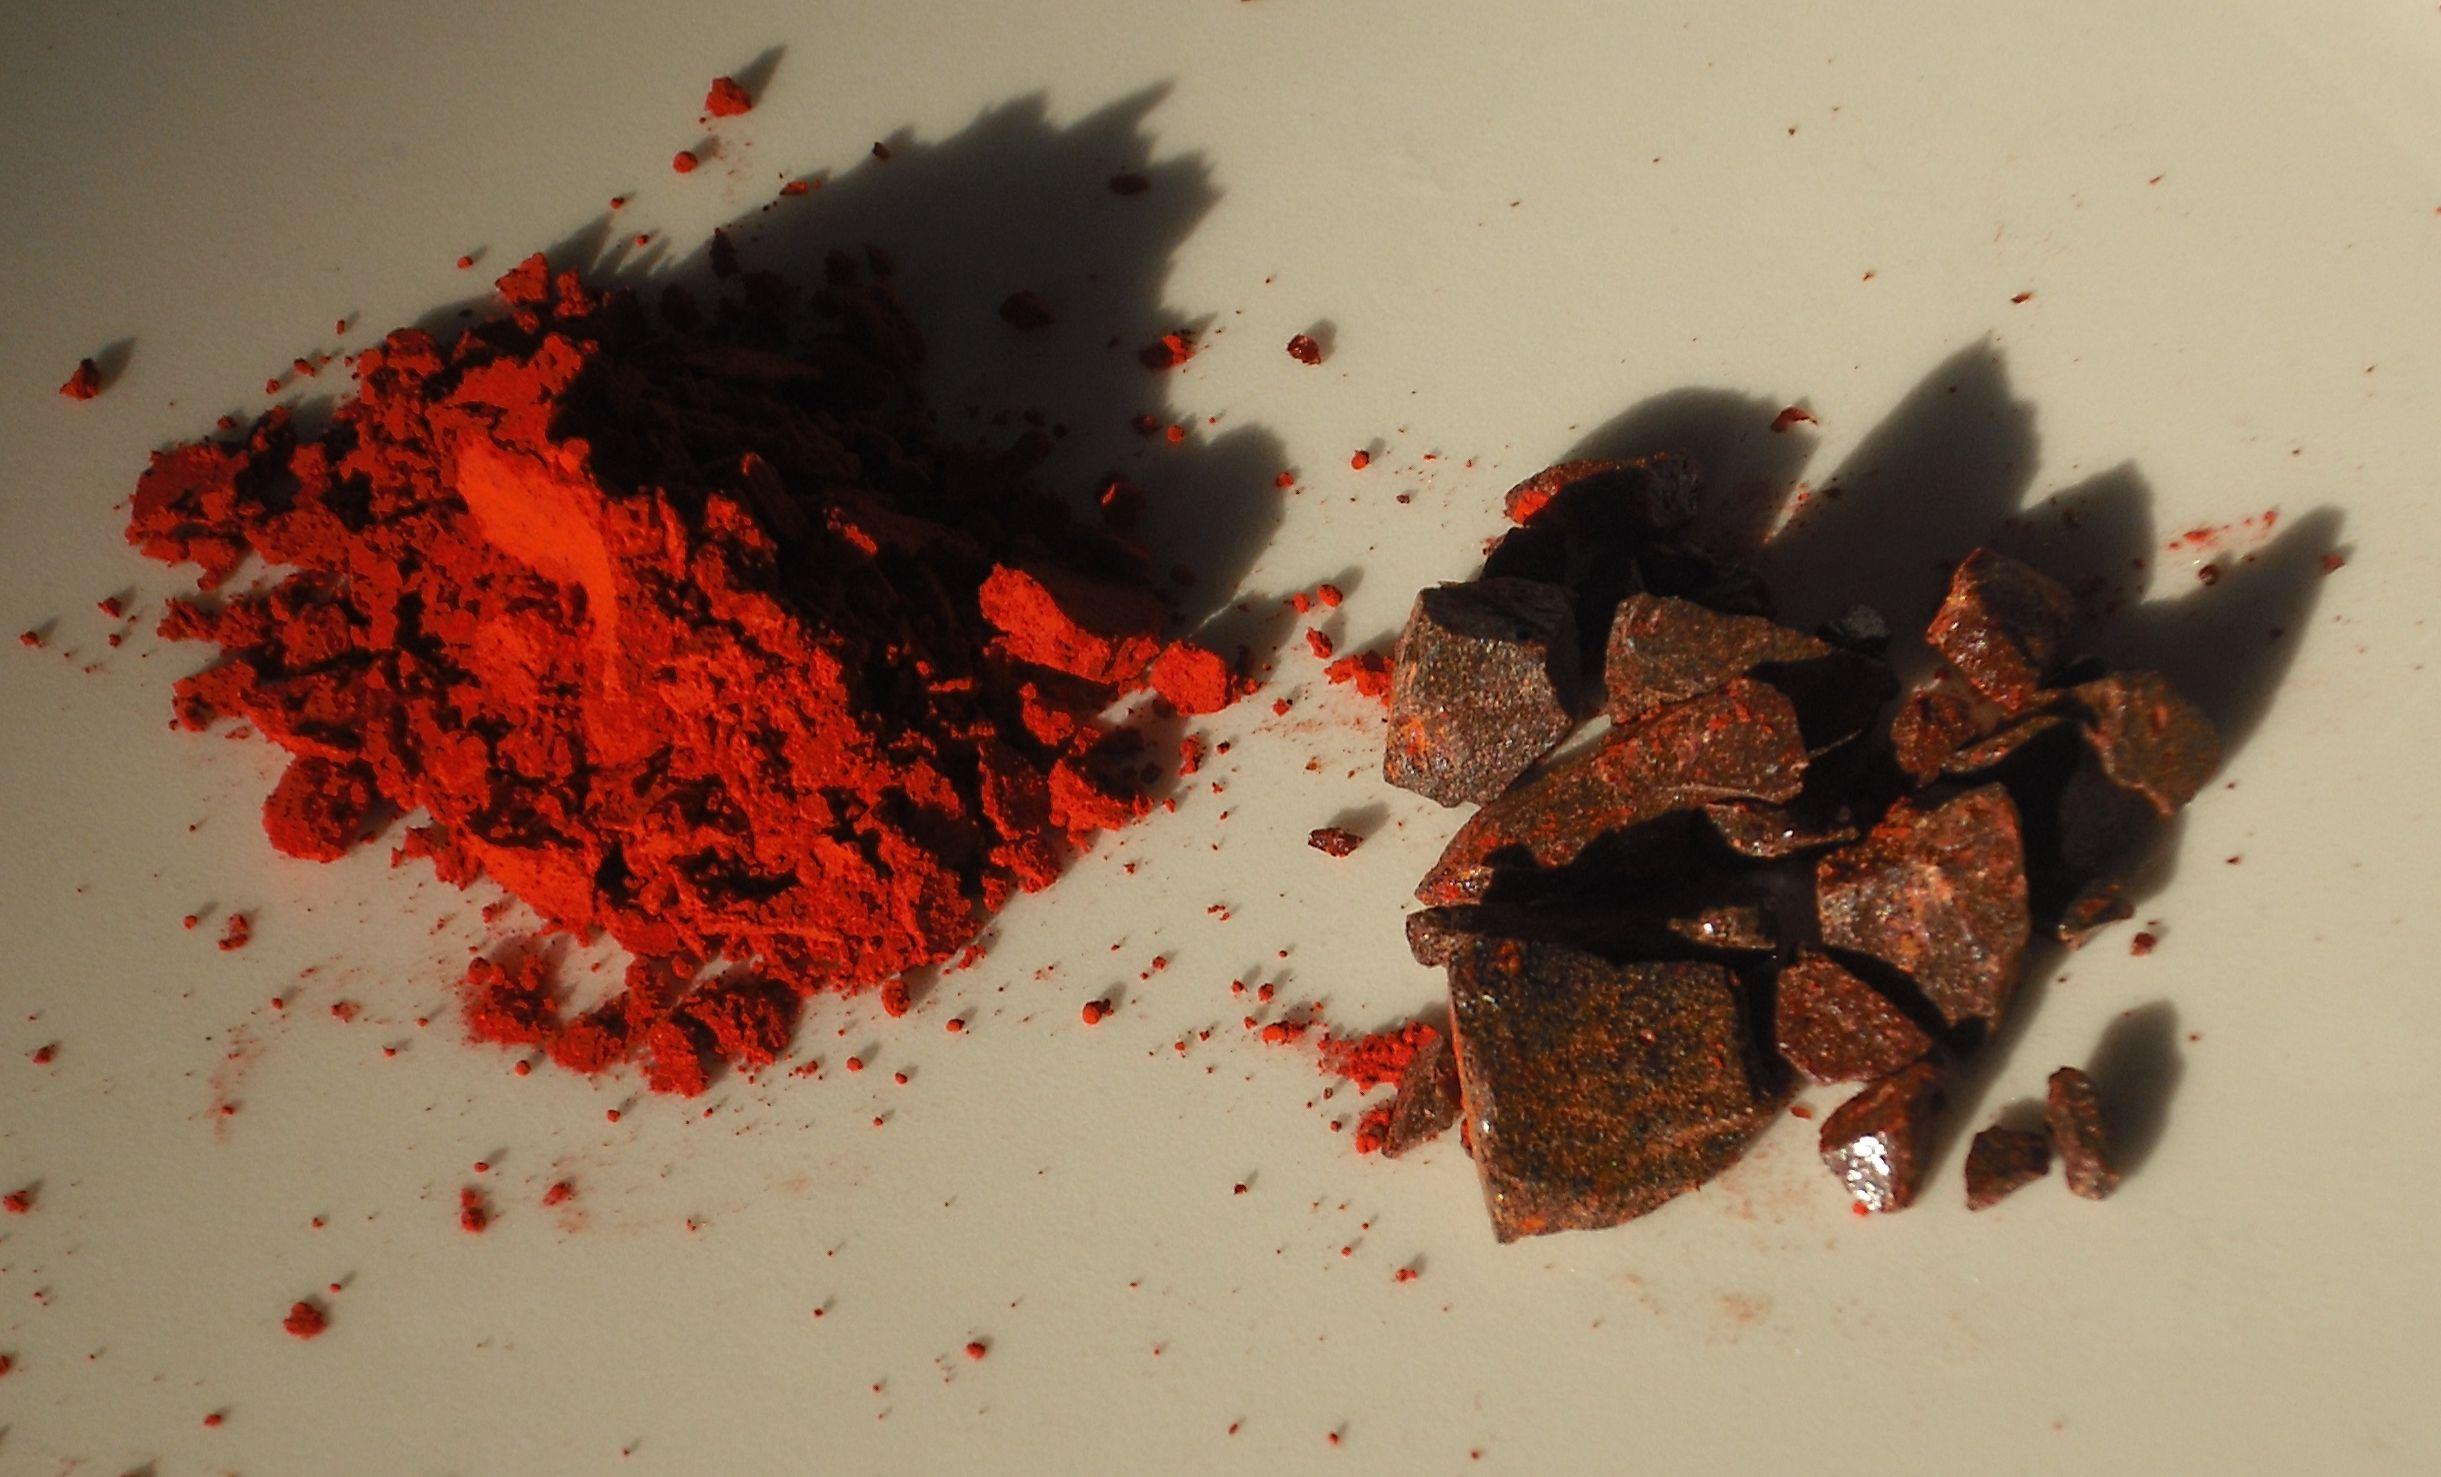 Dragon's_blood_(Daemomorops_draco).jpg